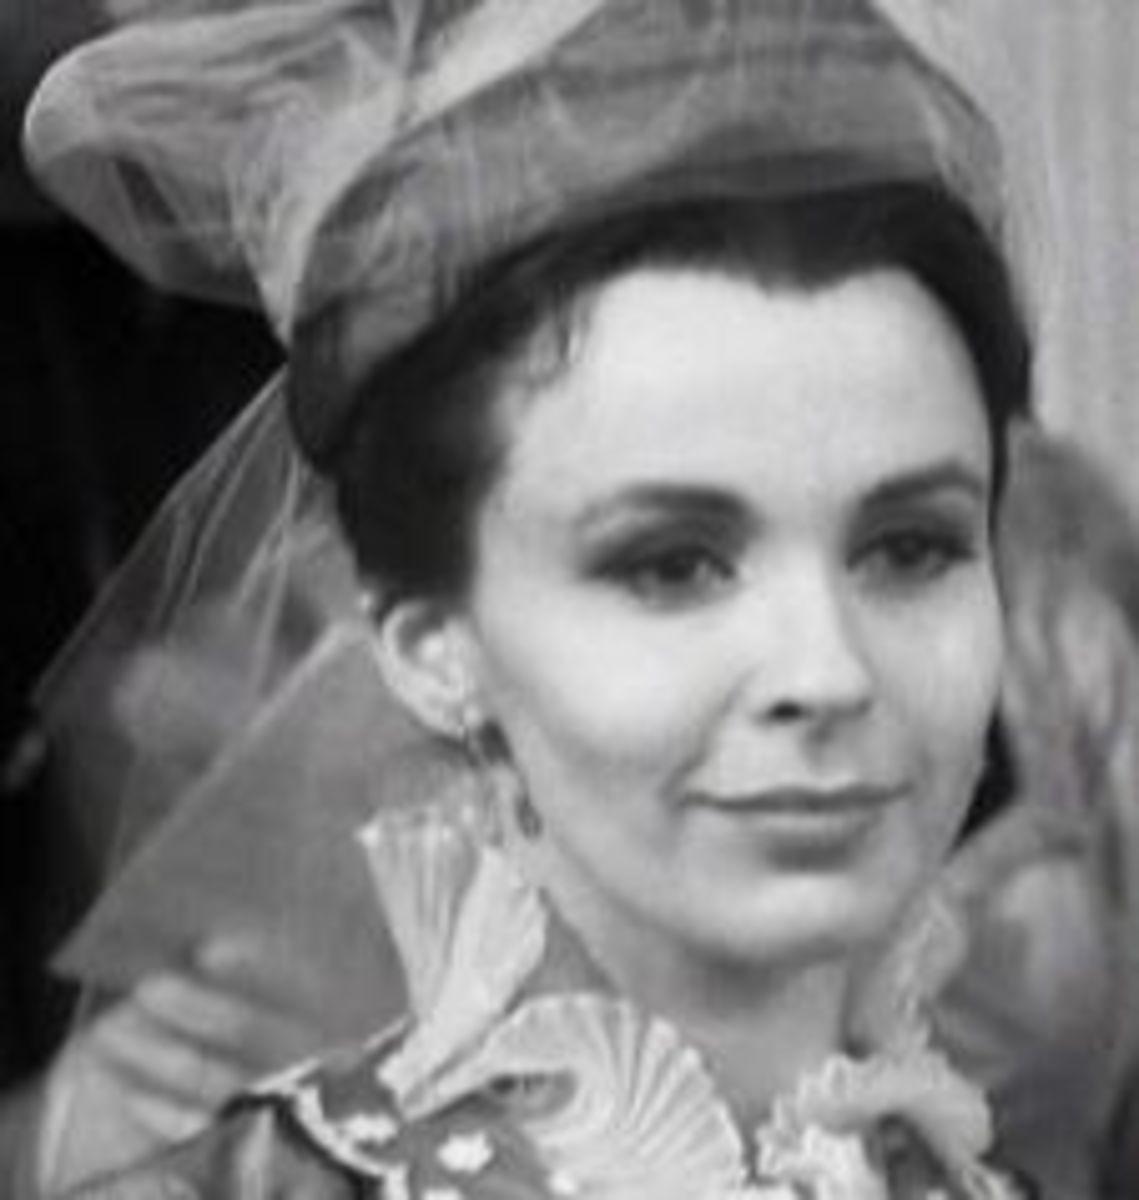 Claire Bloom as Anna Karenina